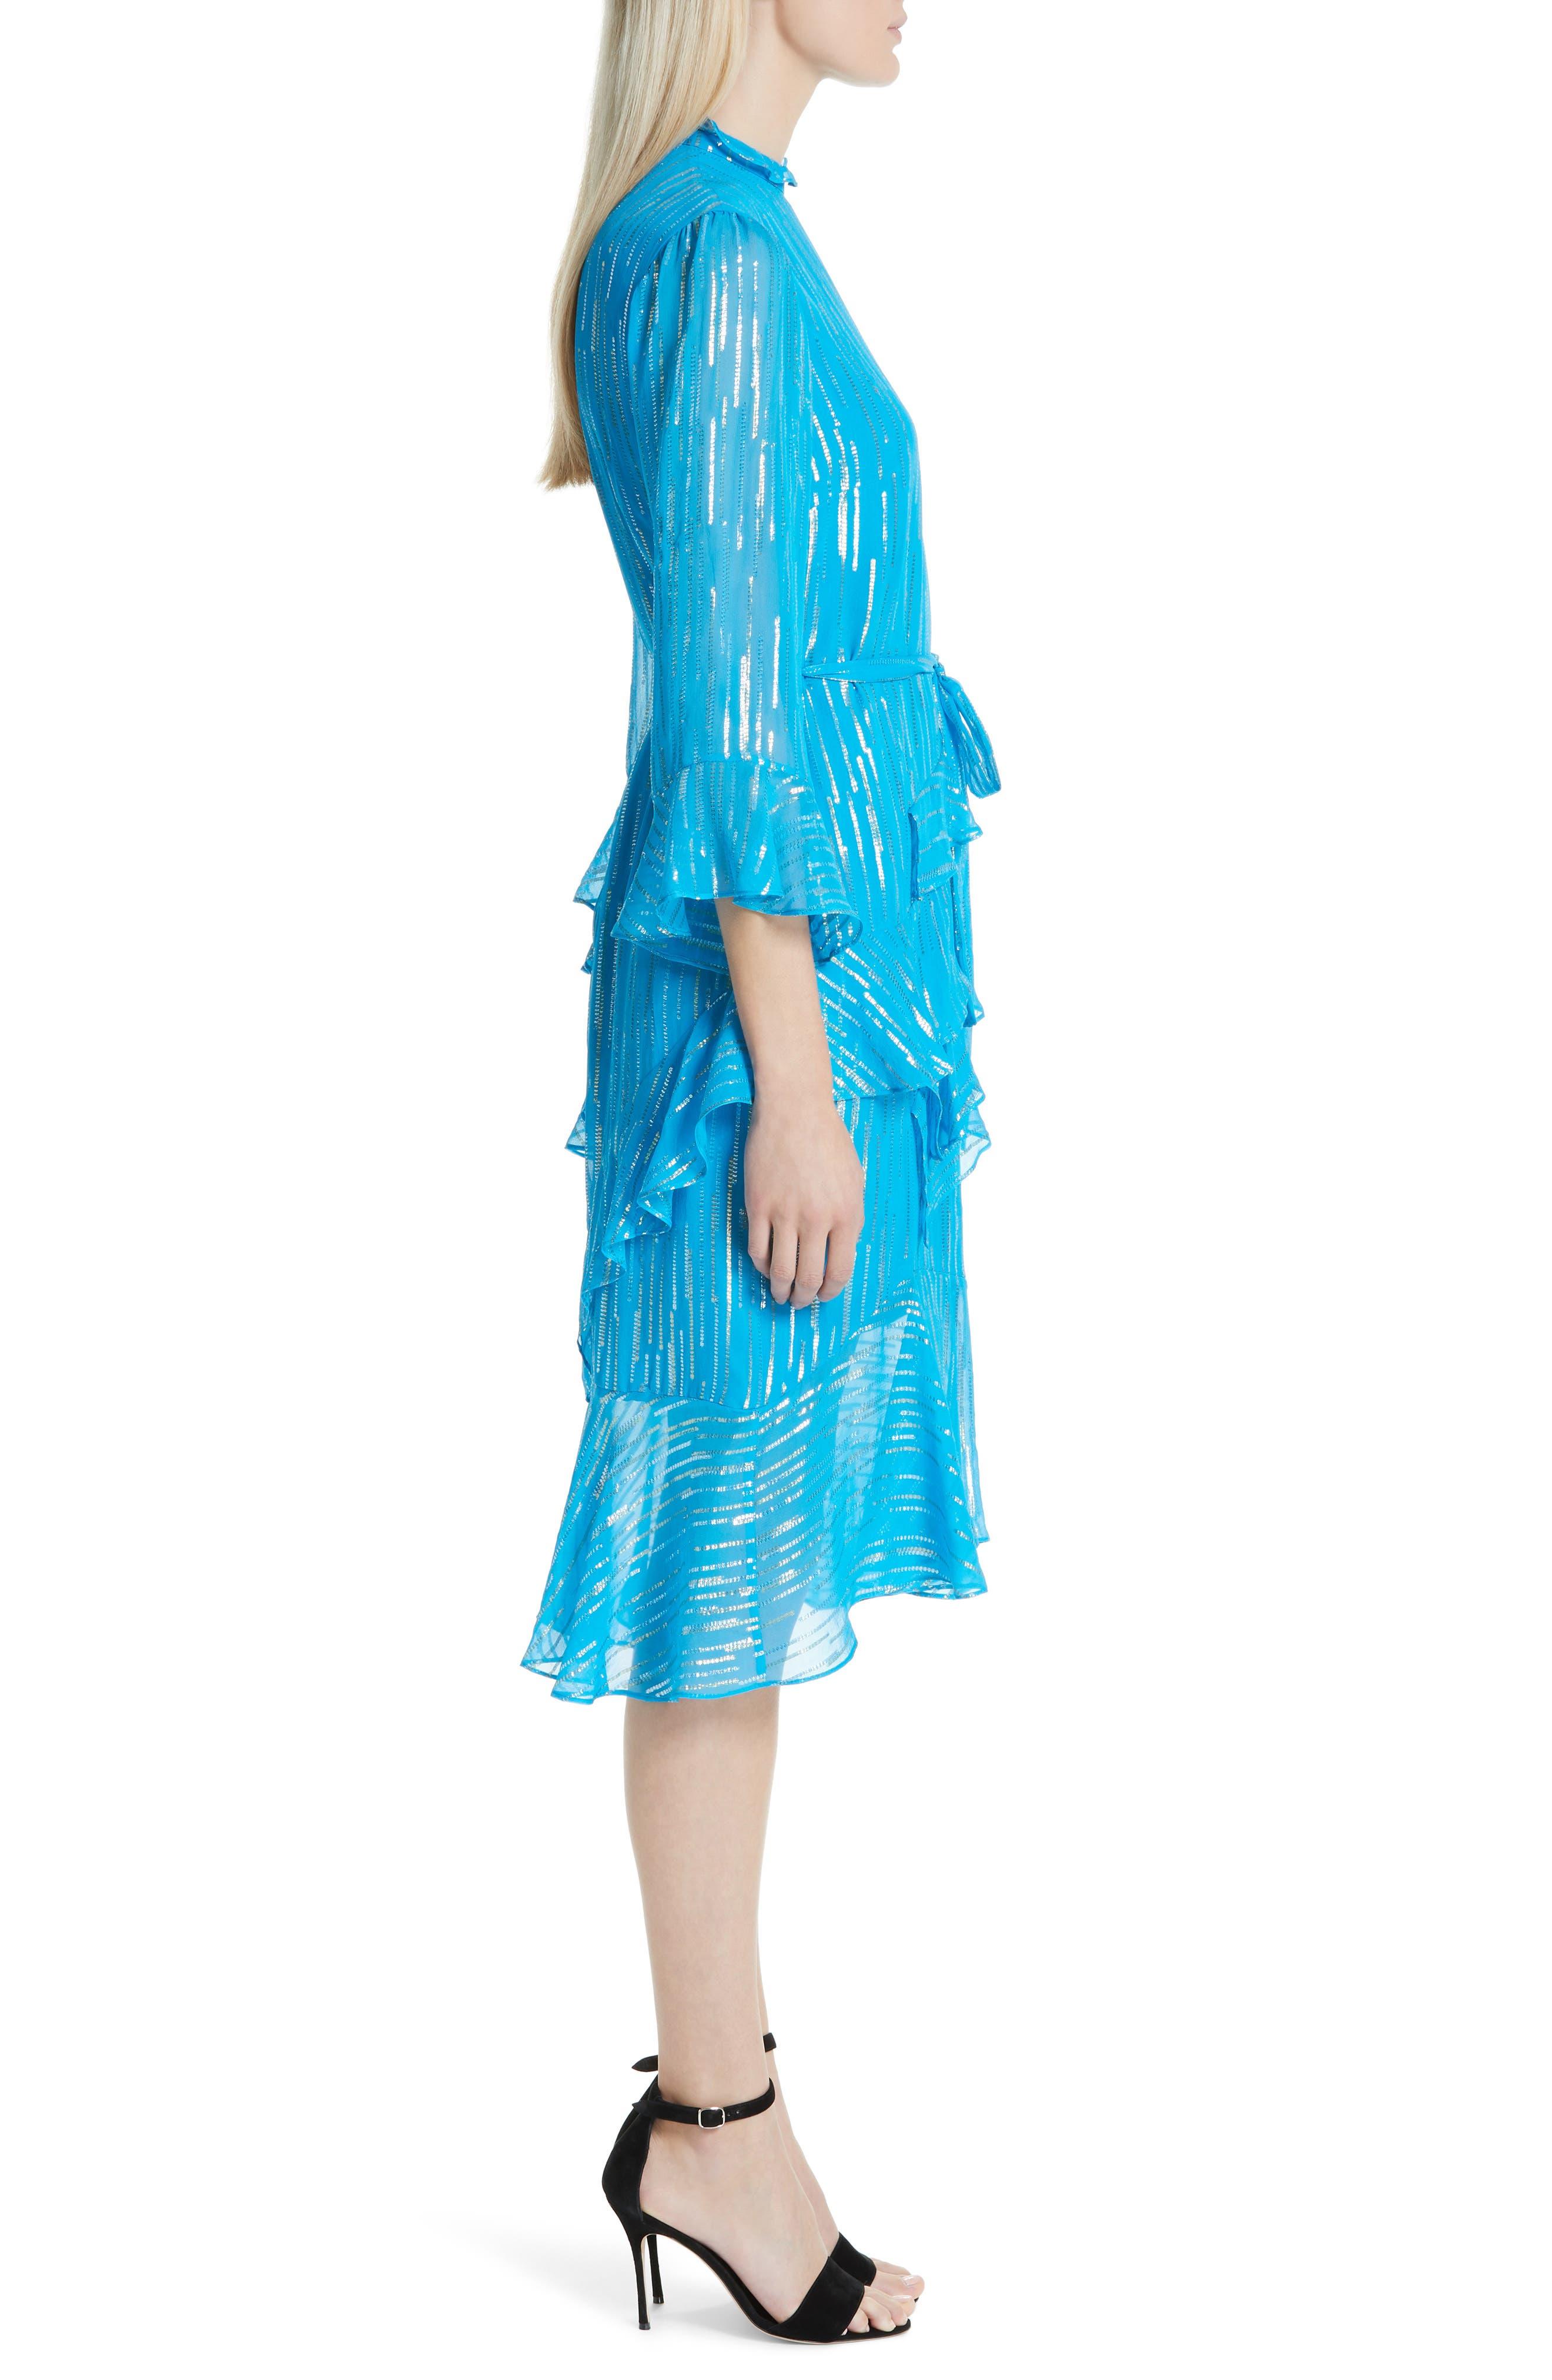 SALONI, Marissa Metallic Ruffle Dress, Alternate thumbnail 4, color, TURQUOISE/ METALLIC